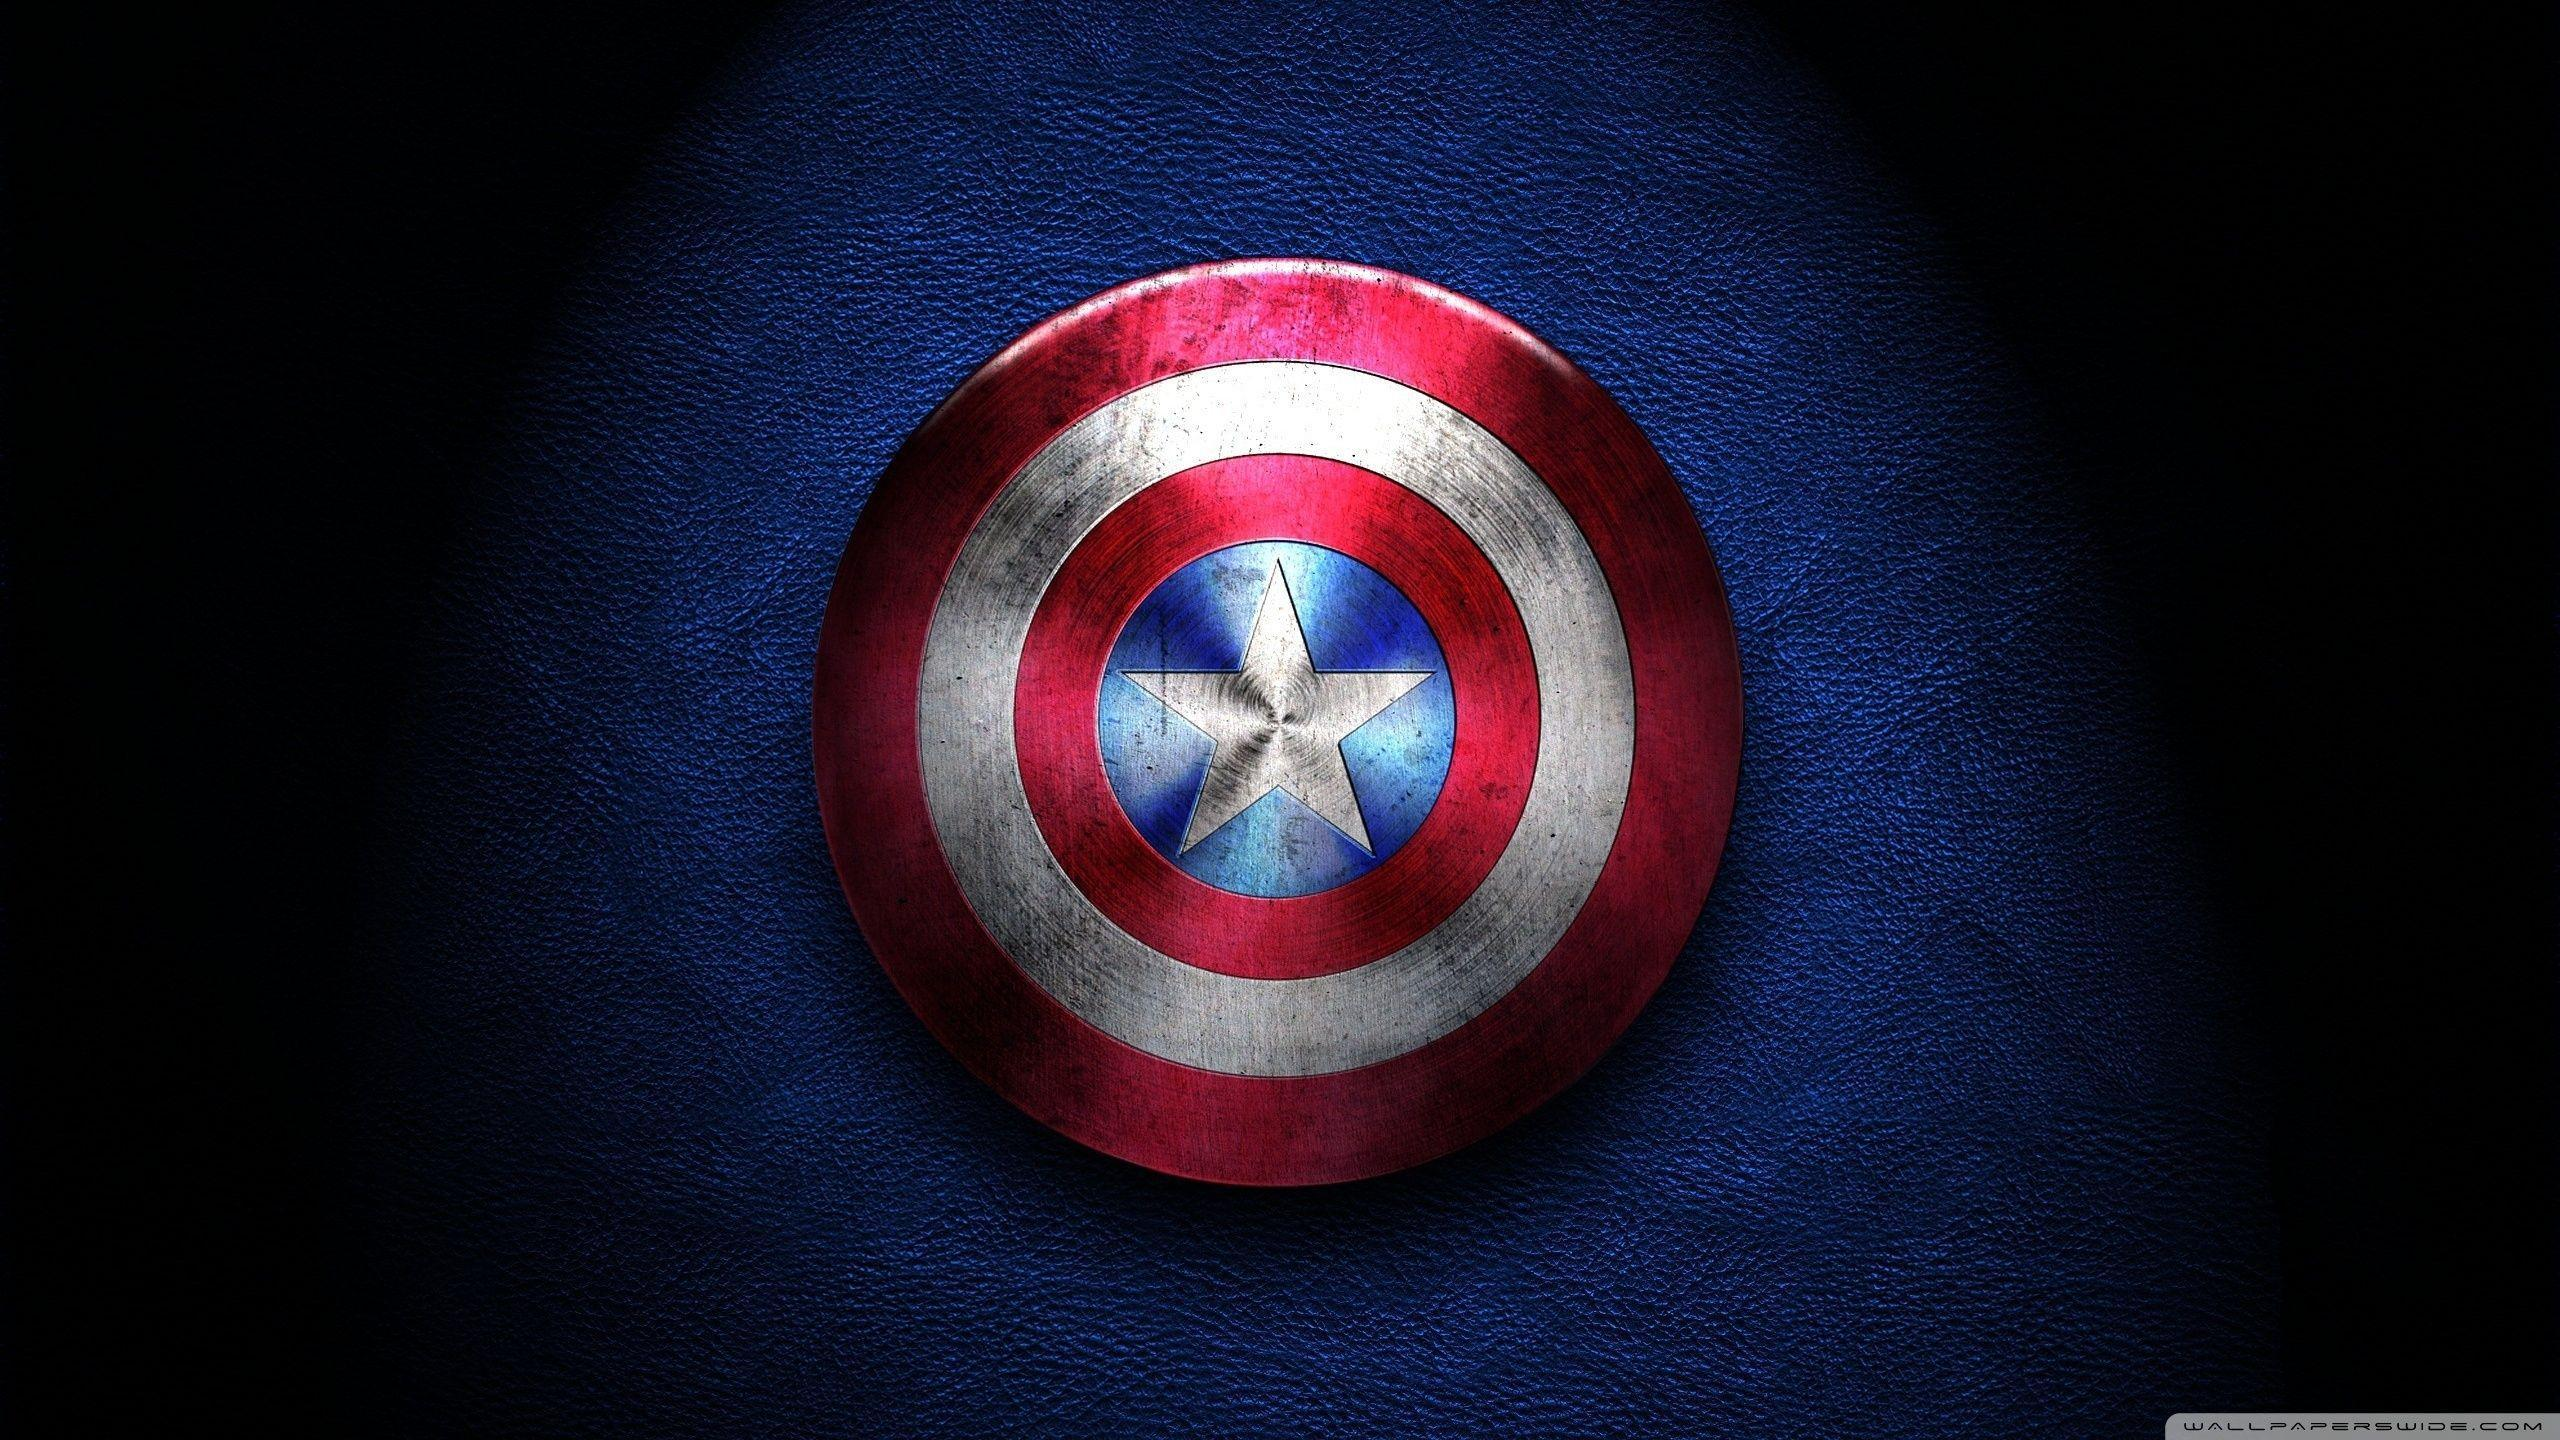 Captain America Shield HD desktop wallpaper : High Definition ...